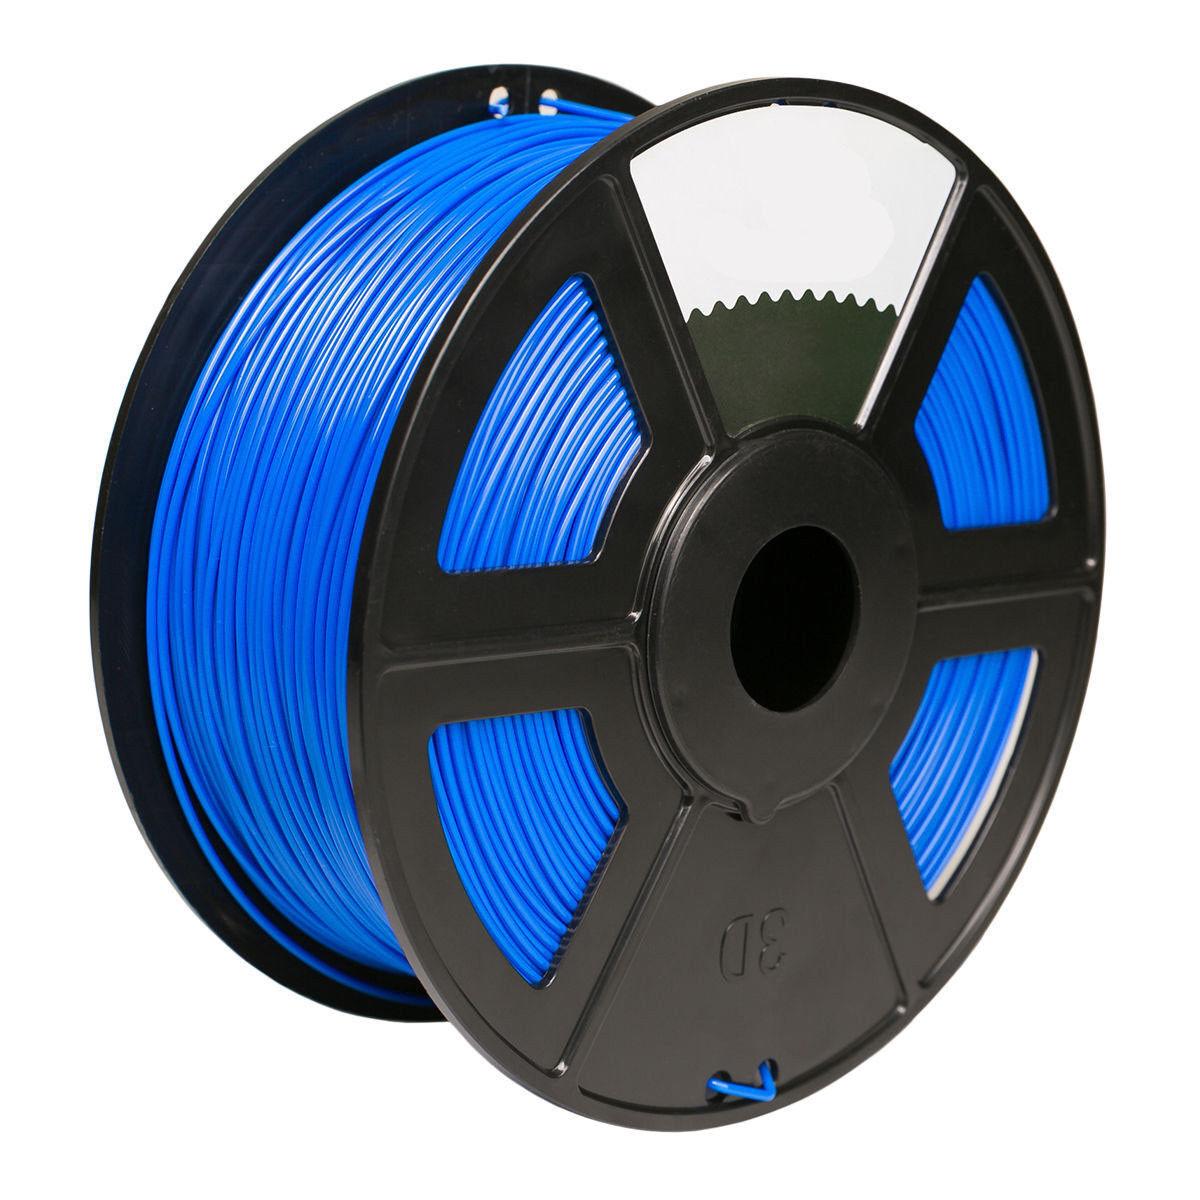 Blue Color 3D Printer Filament 1.75mm 1KG ABS For Print MakerBot RepRap